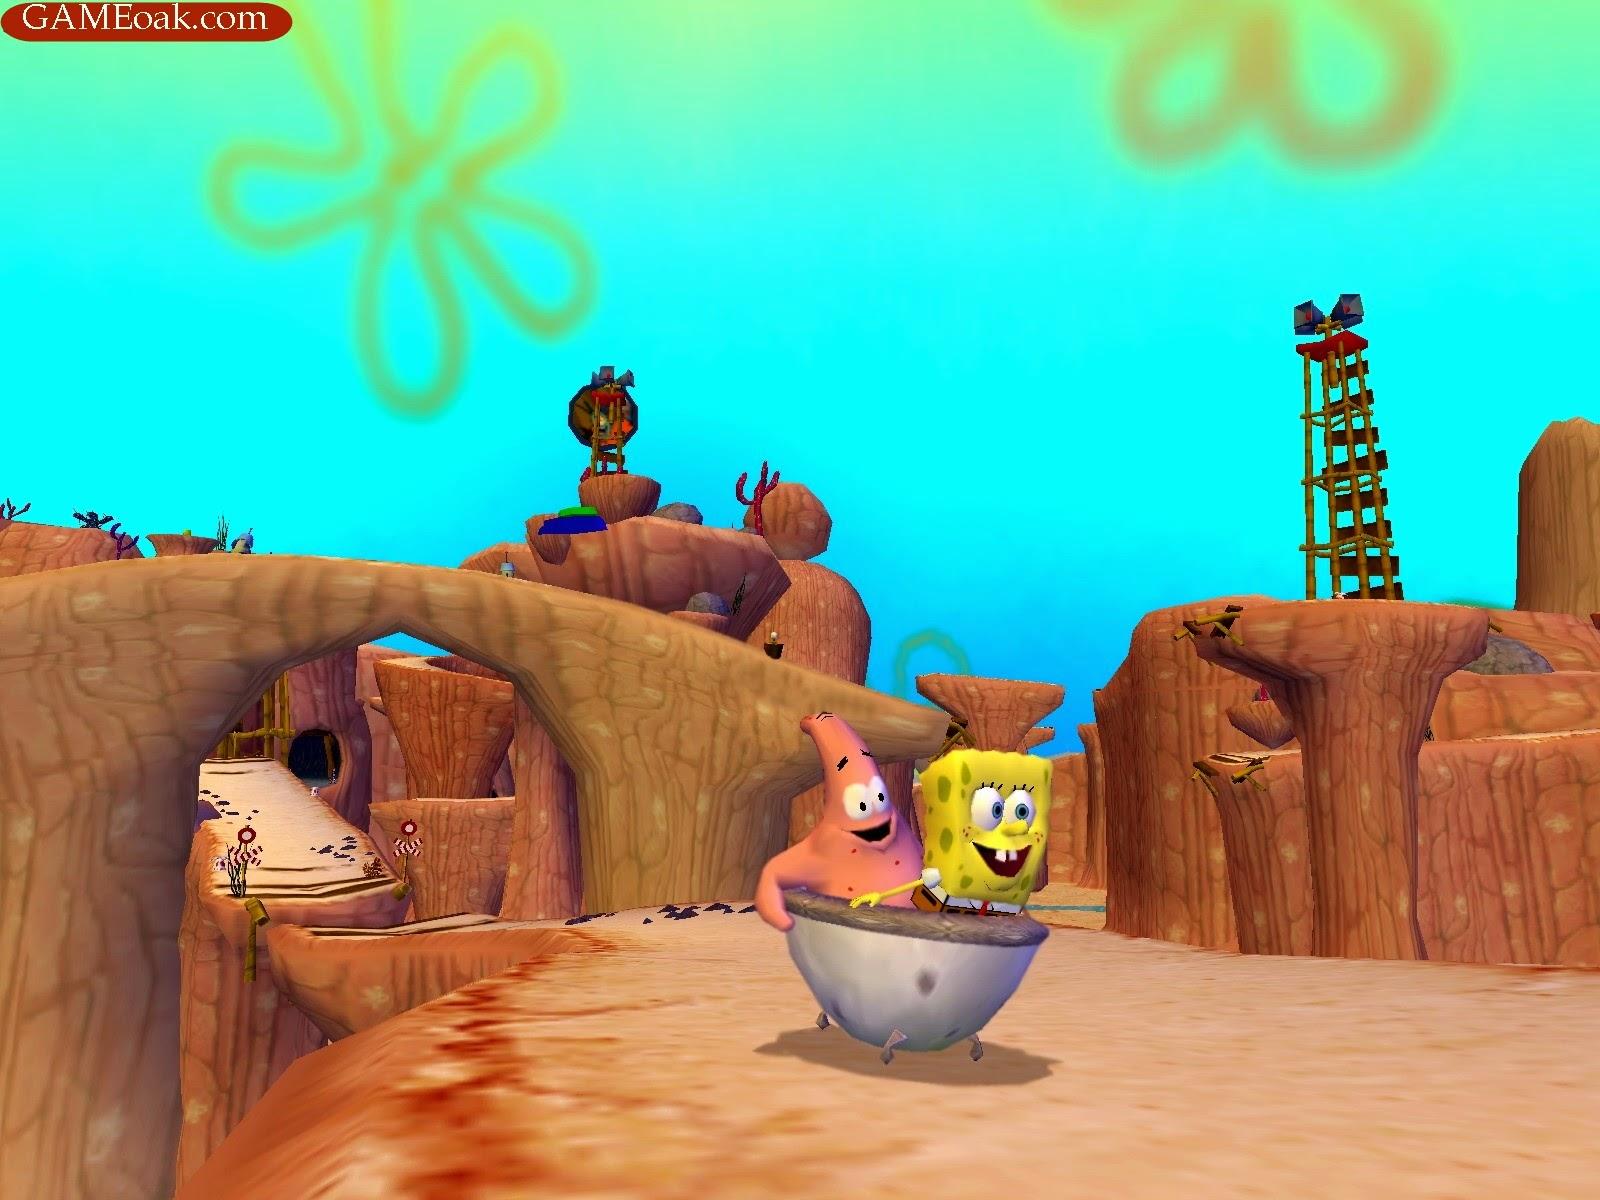 the spongebob squarepants movie game download free games